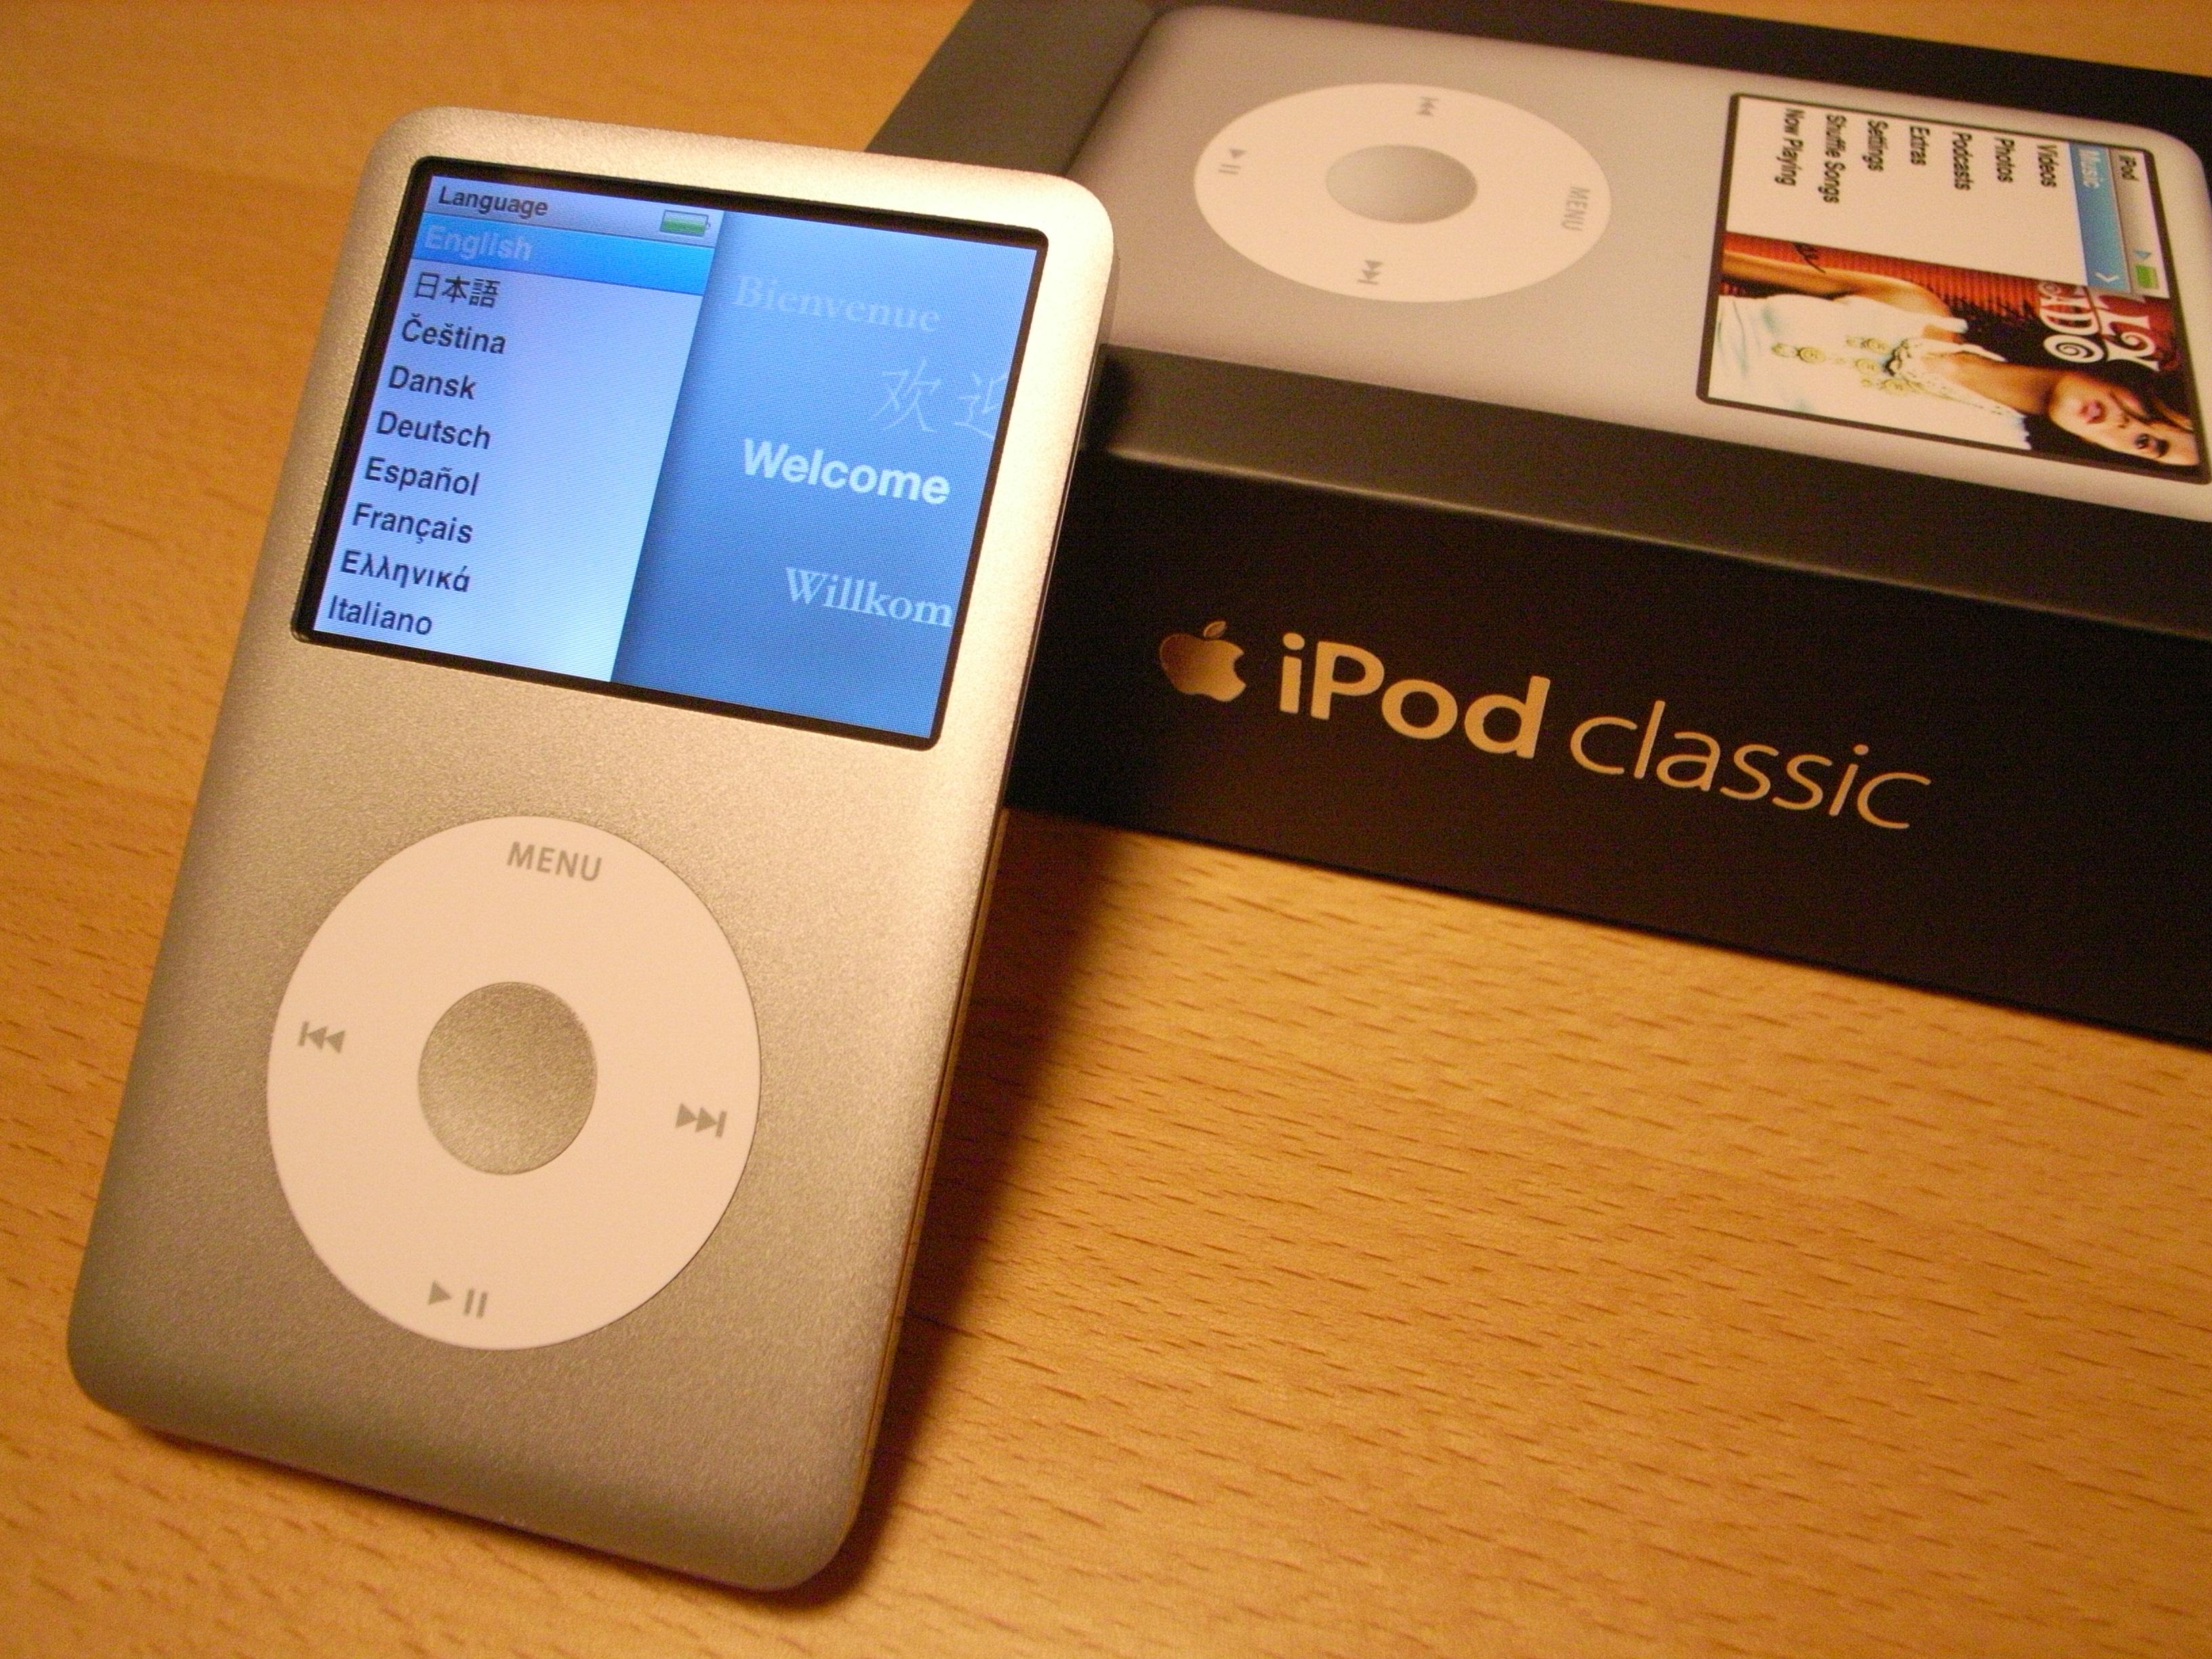 File:IPod classic 6G 80GB packaging-2007-09-22.jpg